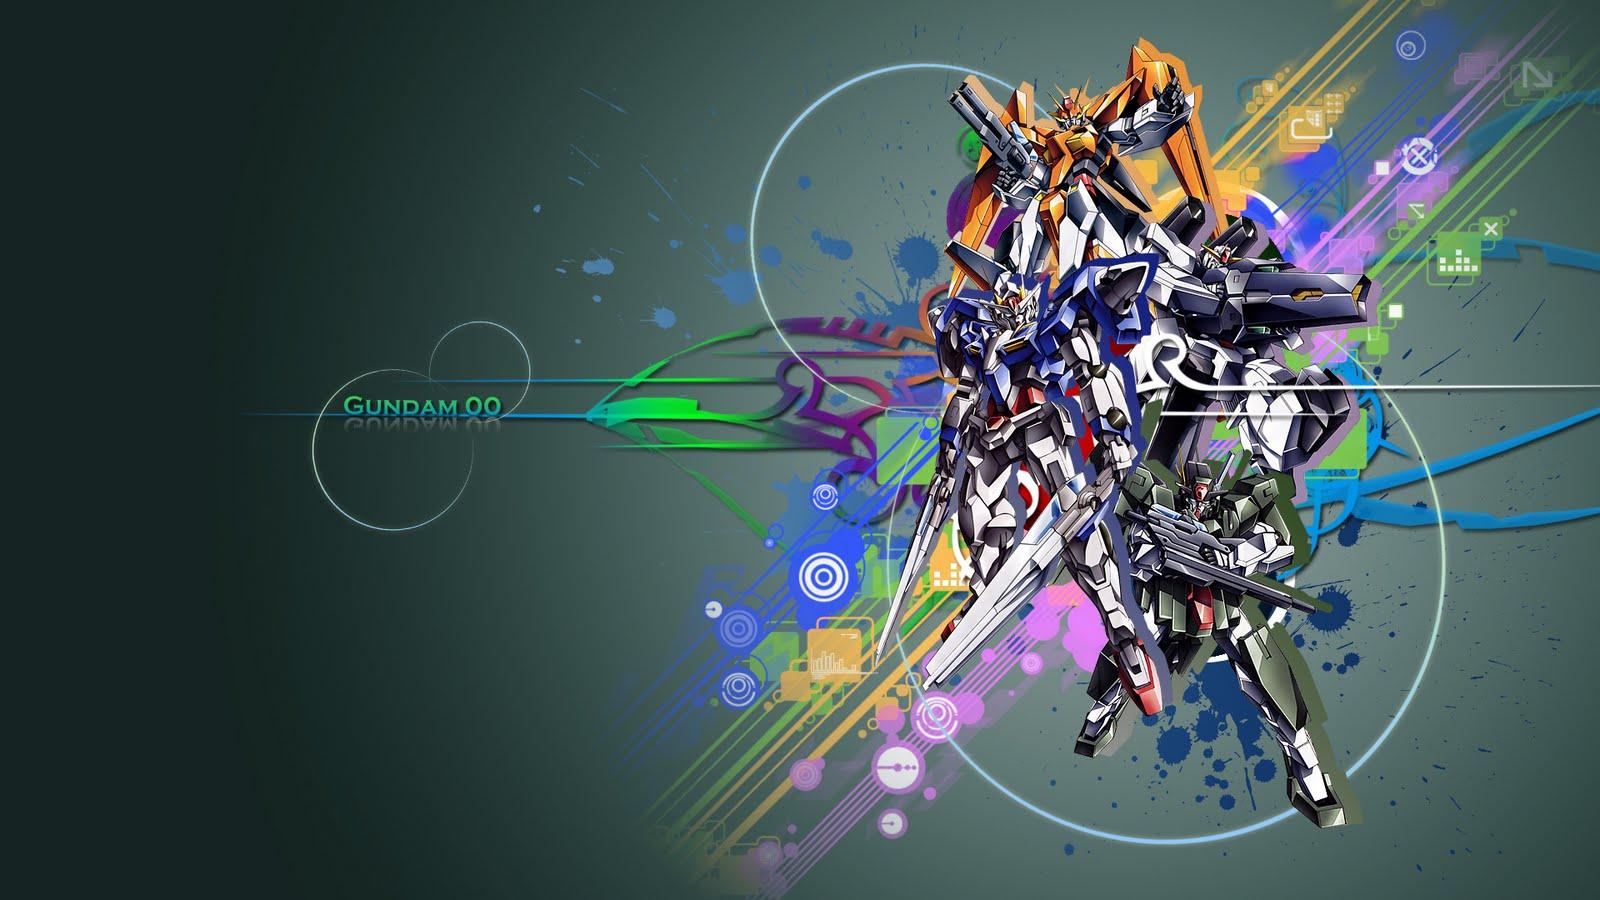 Gundam Anime Wallpaper